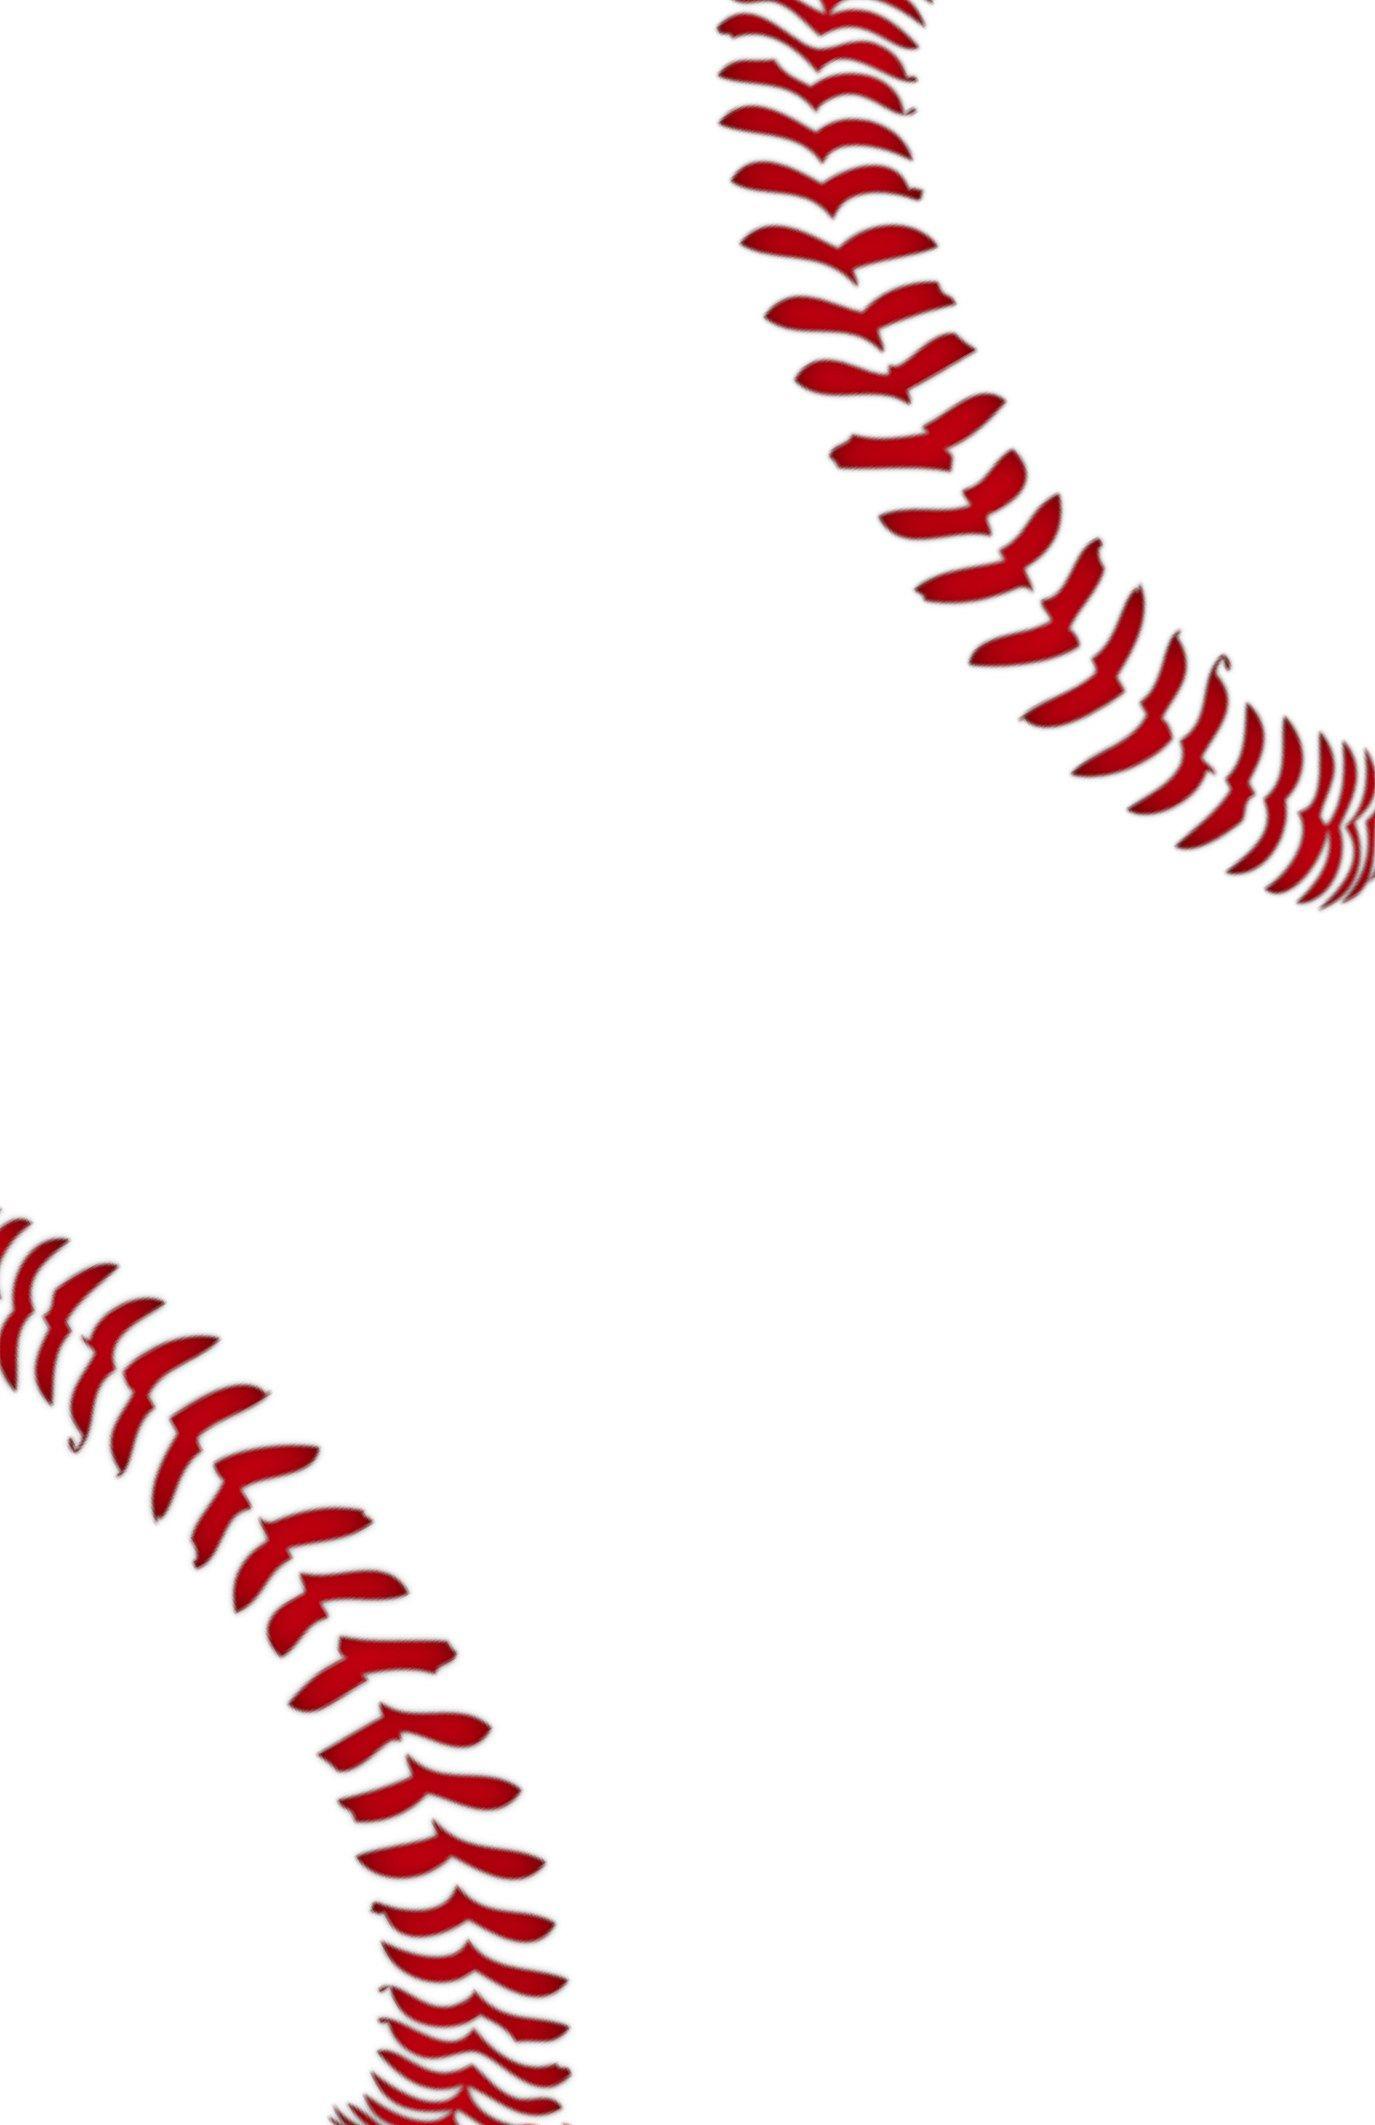 Baseball Party Invitations Free Printable   Birthday Party's - Free Printable Sports Birthday Invitation Templates